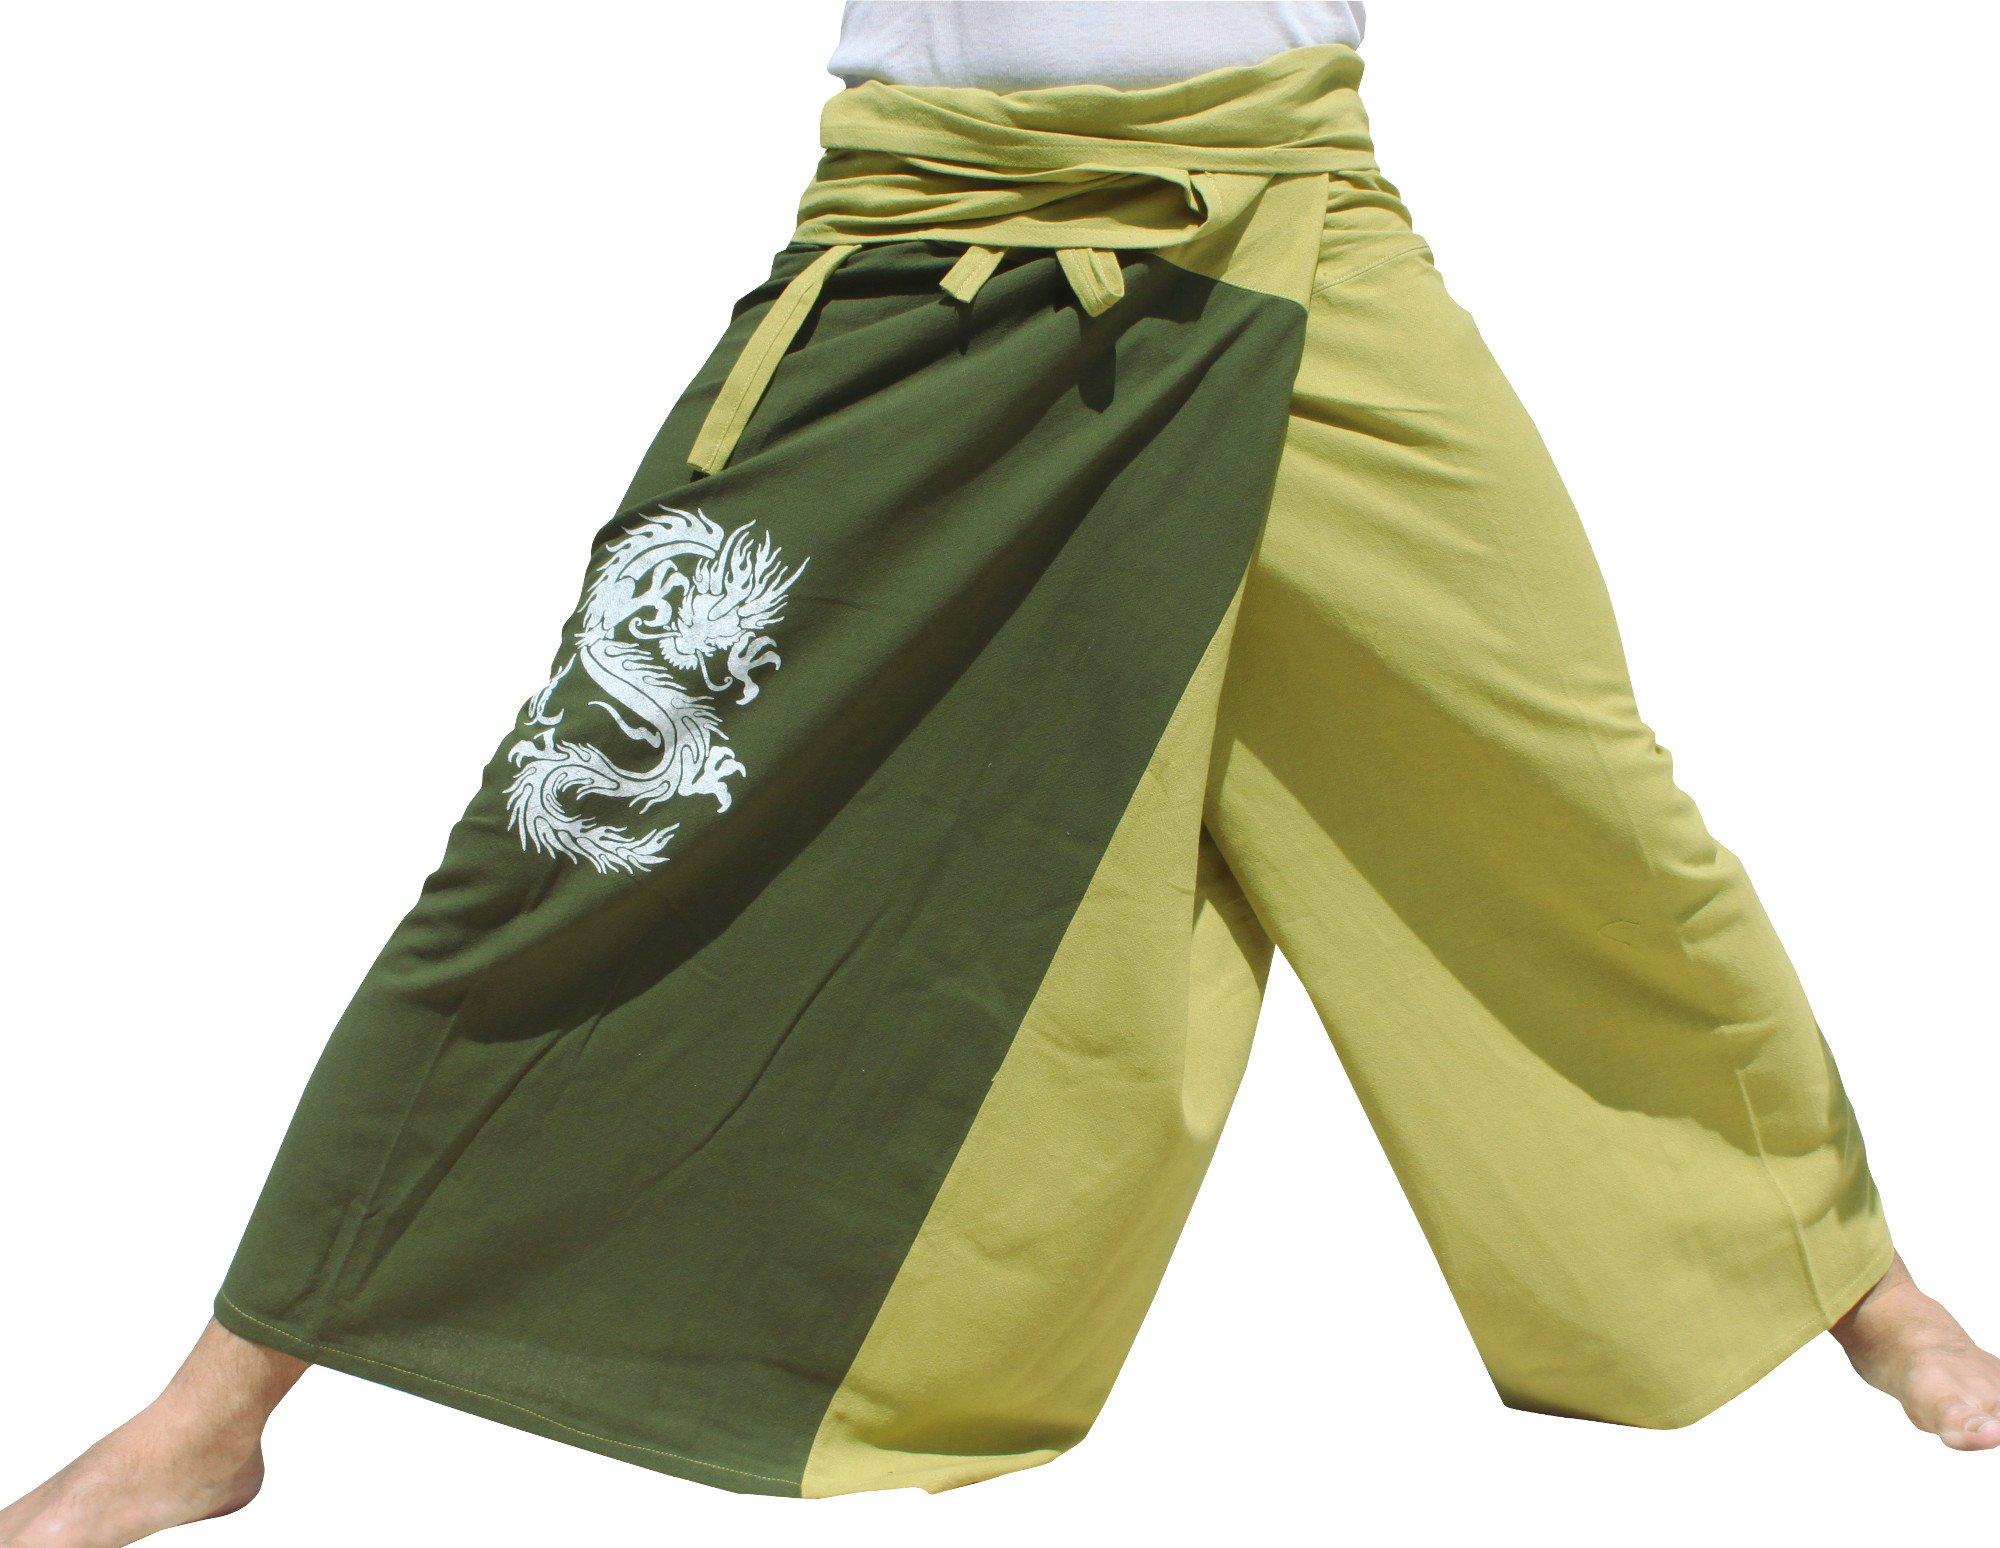 Raan Pah Muang Thick Cotton Two Color Fire Dragon Samurai Wrap Pants, X-Large, Green Tab Dark Green by Raan Pah Muang